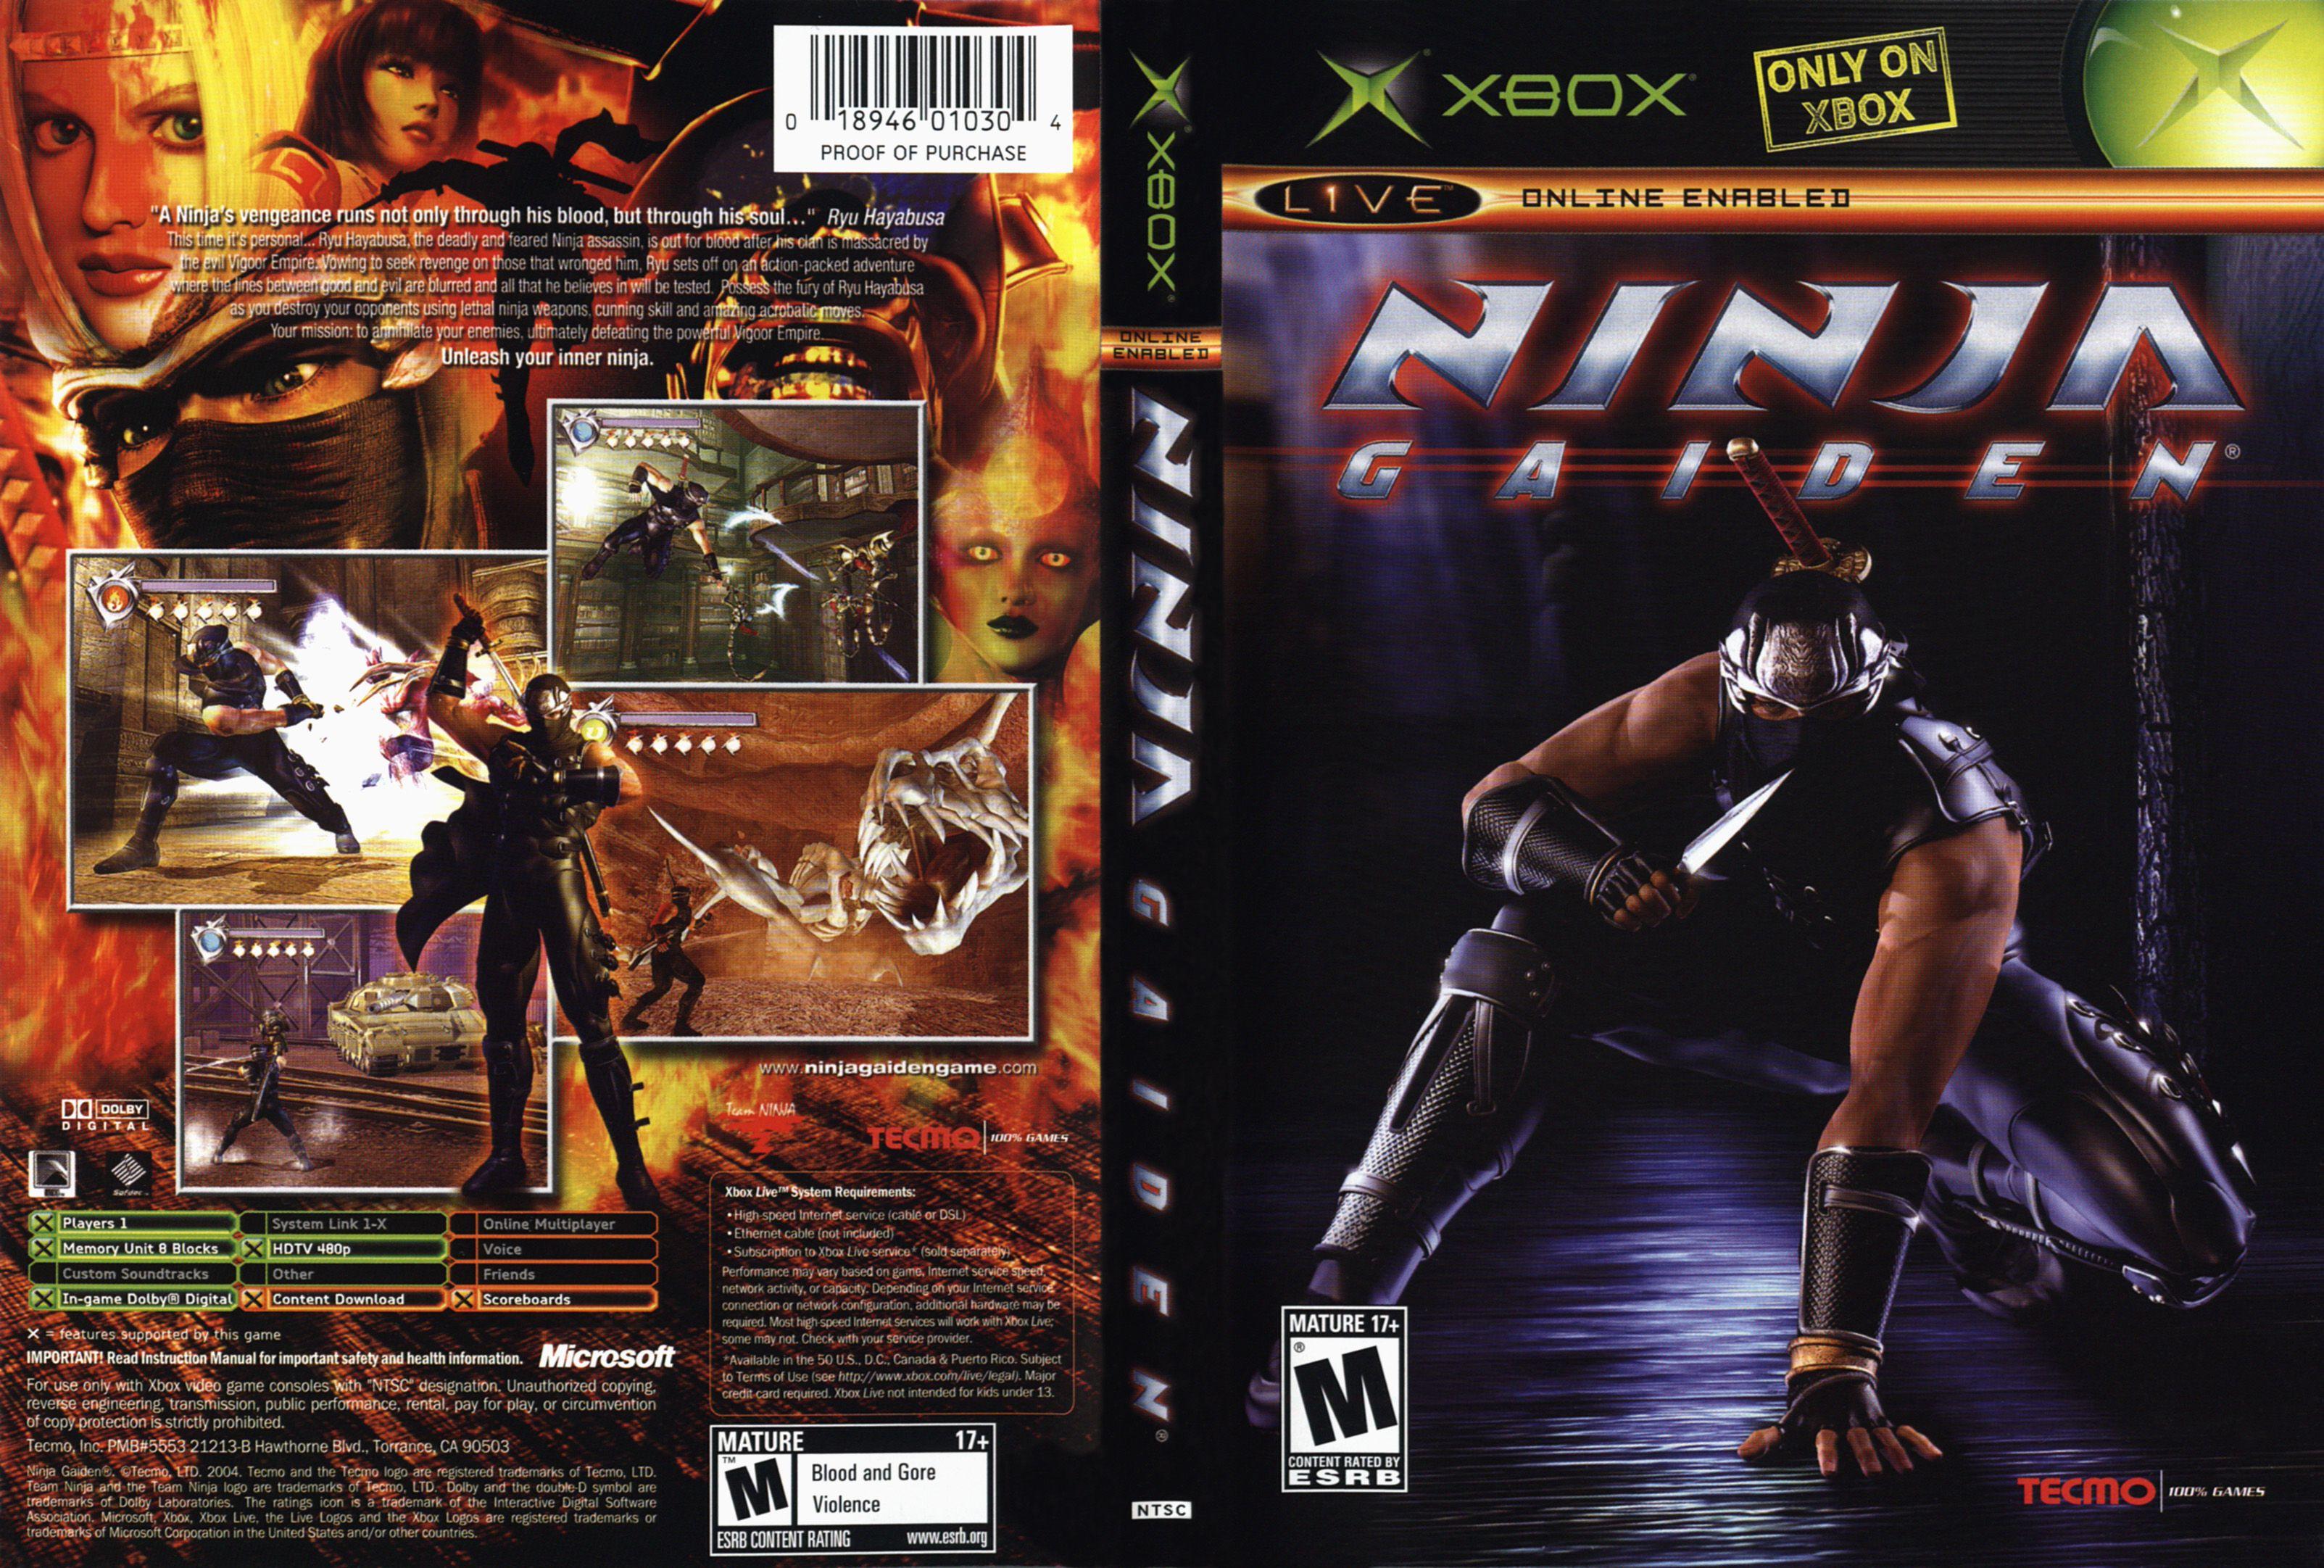 Xbox Ninja Gaiden Xbox Ninja Gaiden Xbox Live